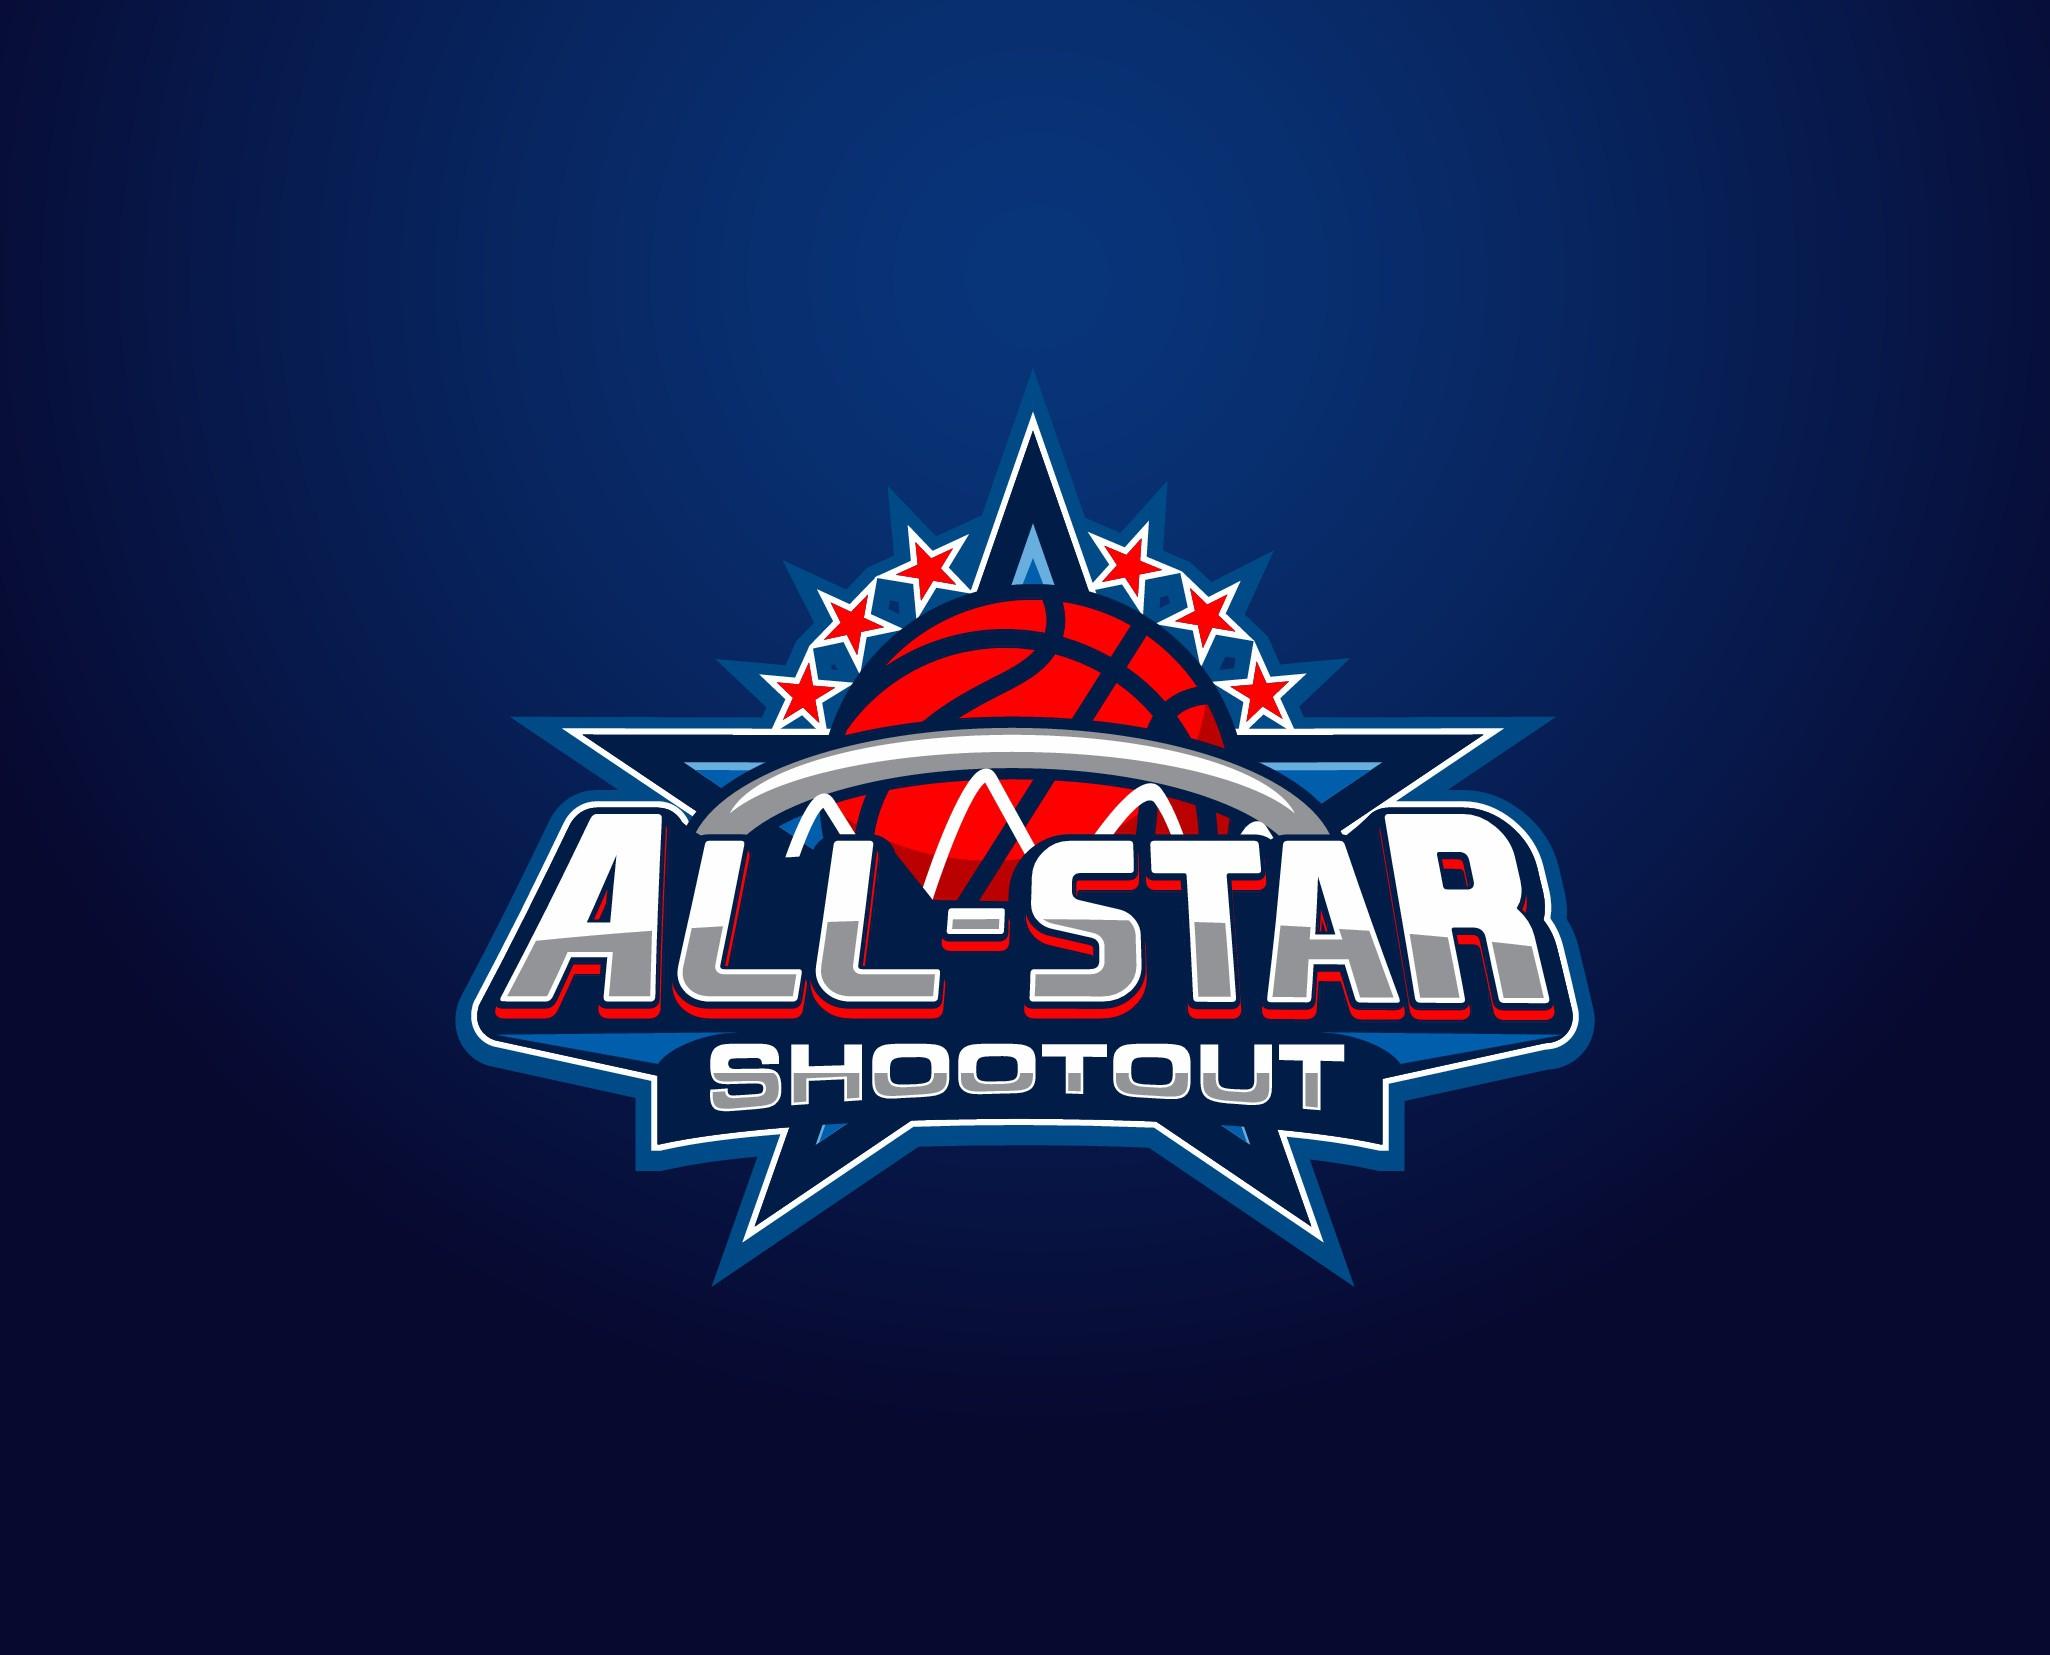 All-Star Shootout Logo Needed - Fun basketball game at theme parks!